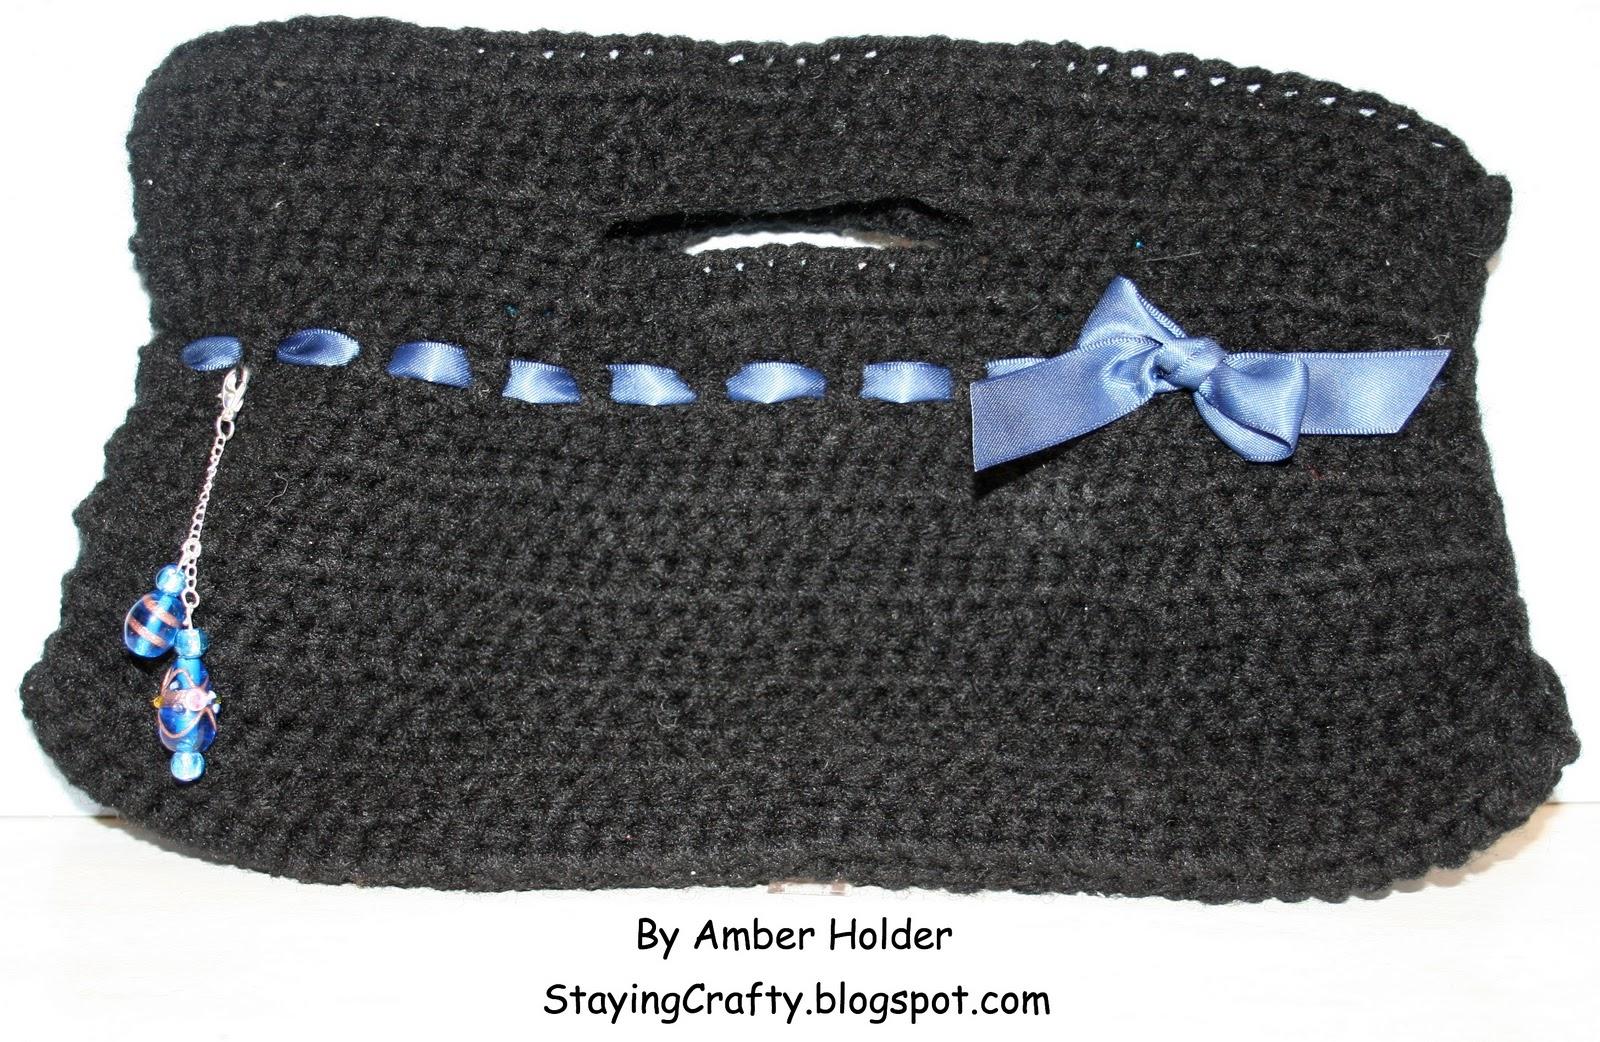 Crochet Handbags - Shop for Crochet Handbags at Polyvore